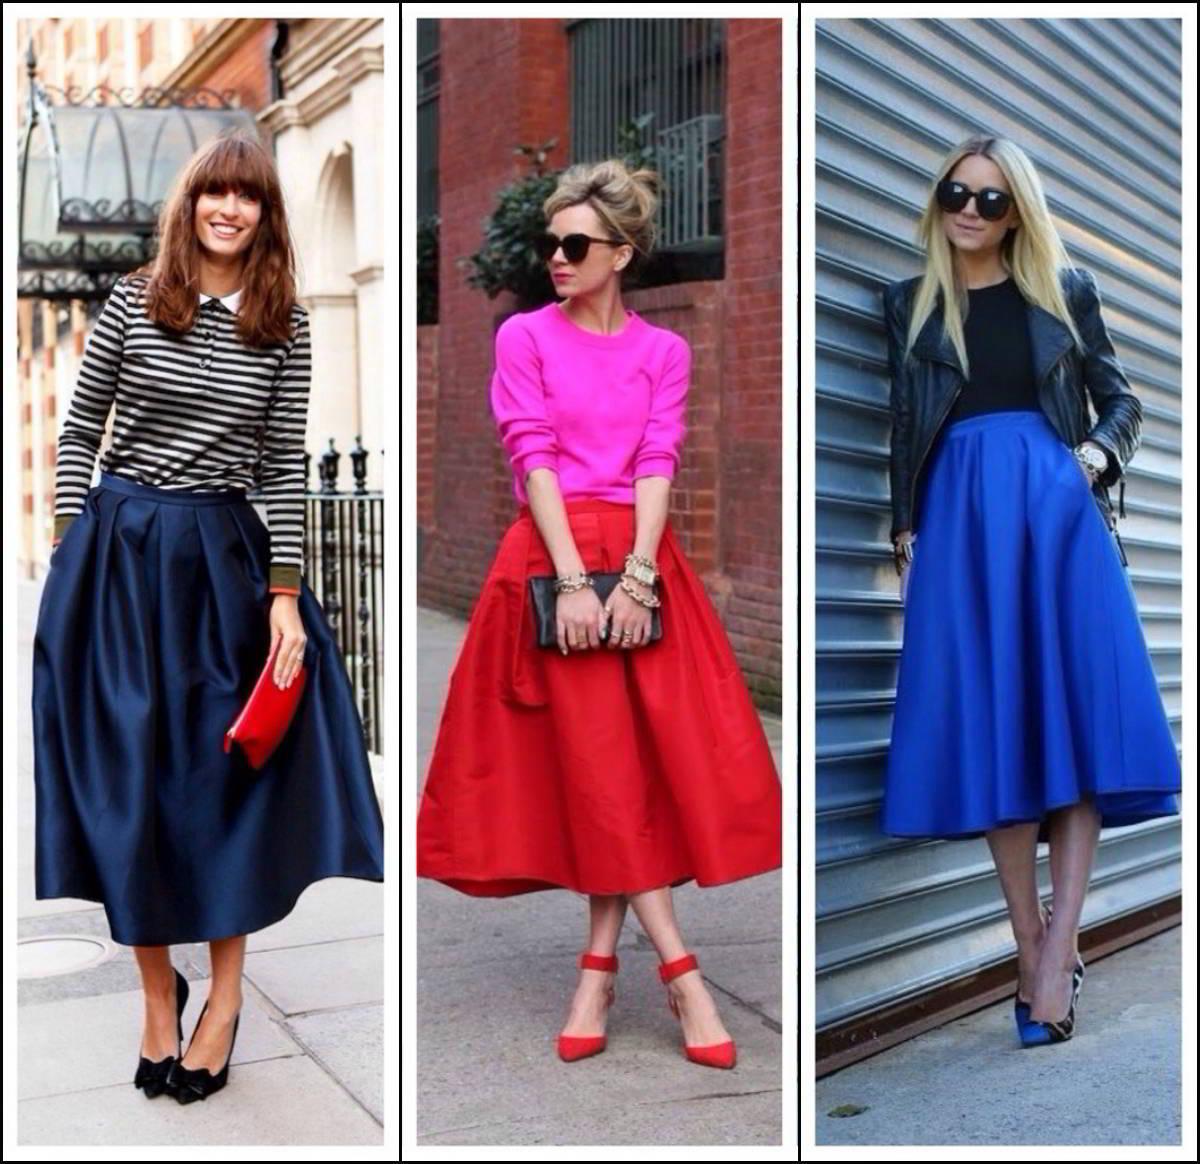 Направление моды юбки на 2017 год